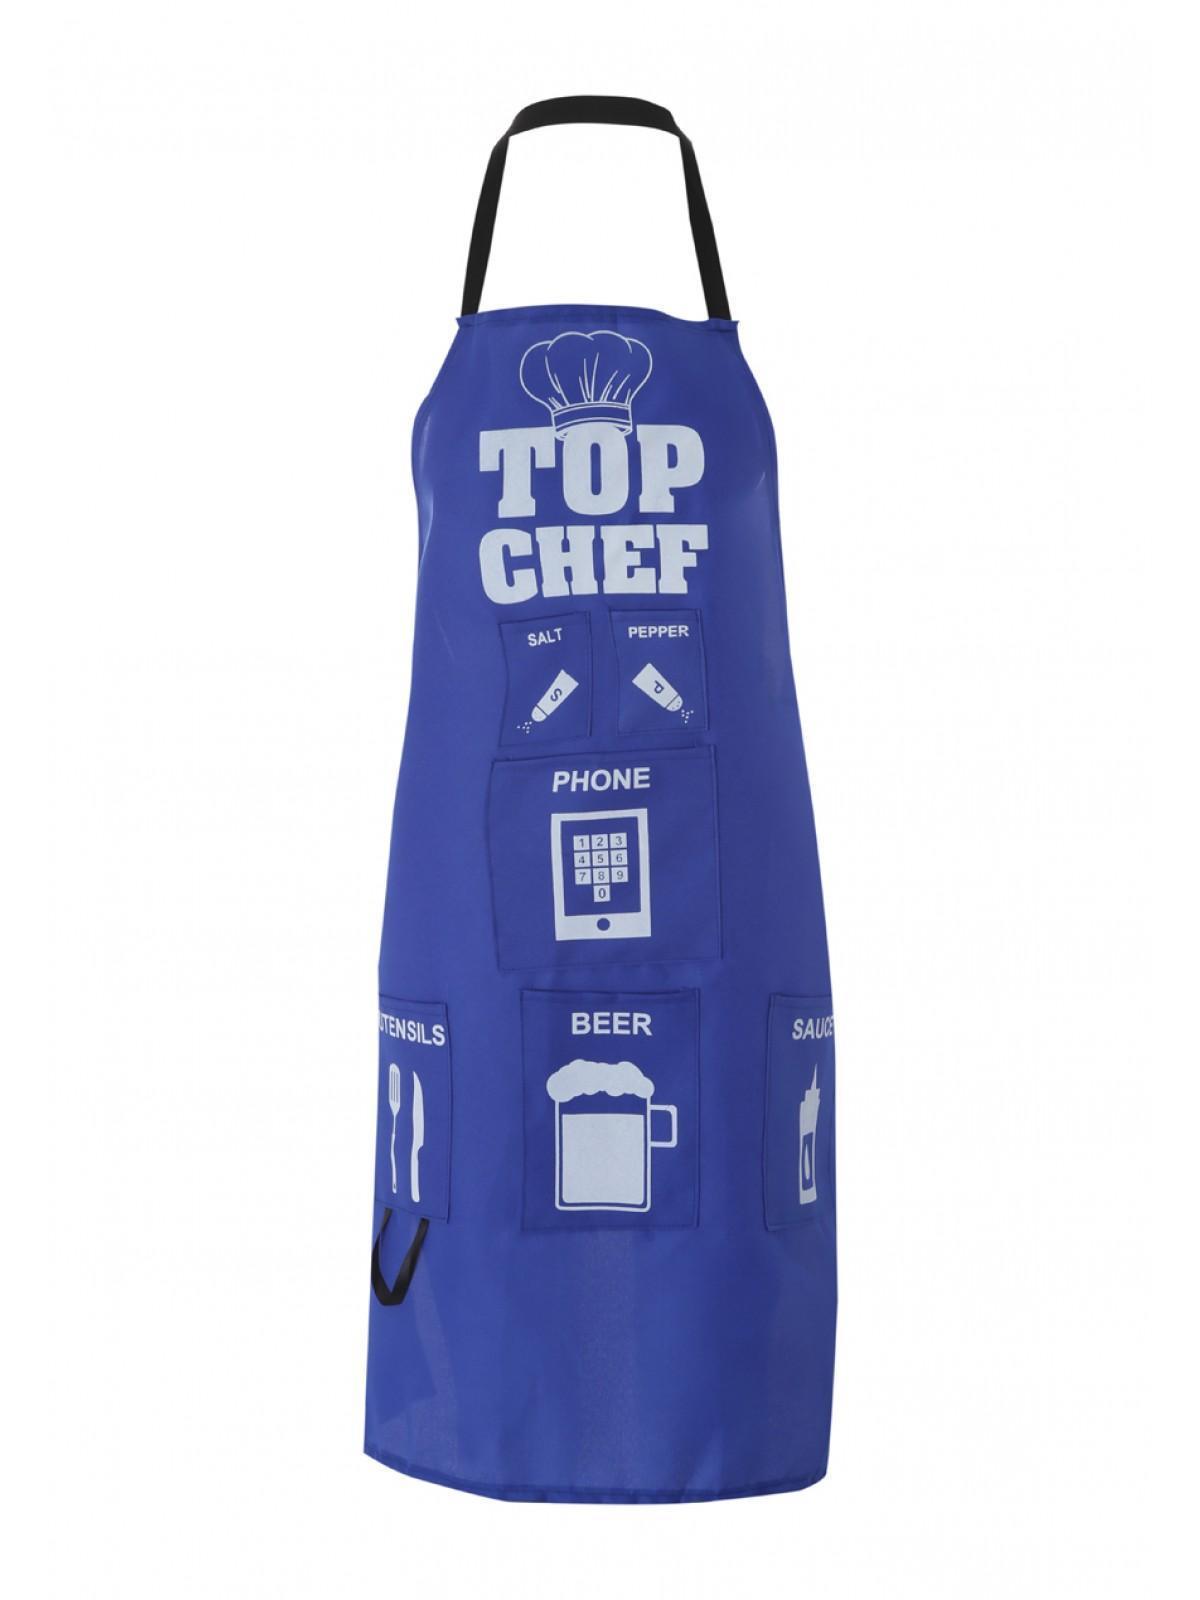 Blue apron top chef - Home Mens Top Chef Apron Previousnext Zoom